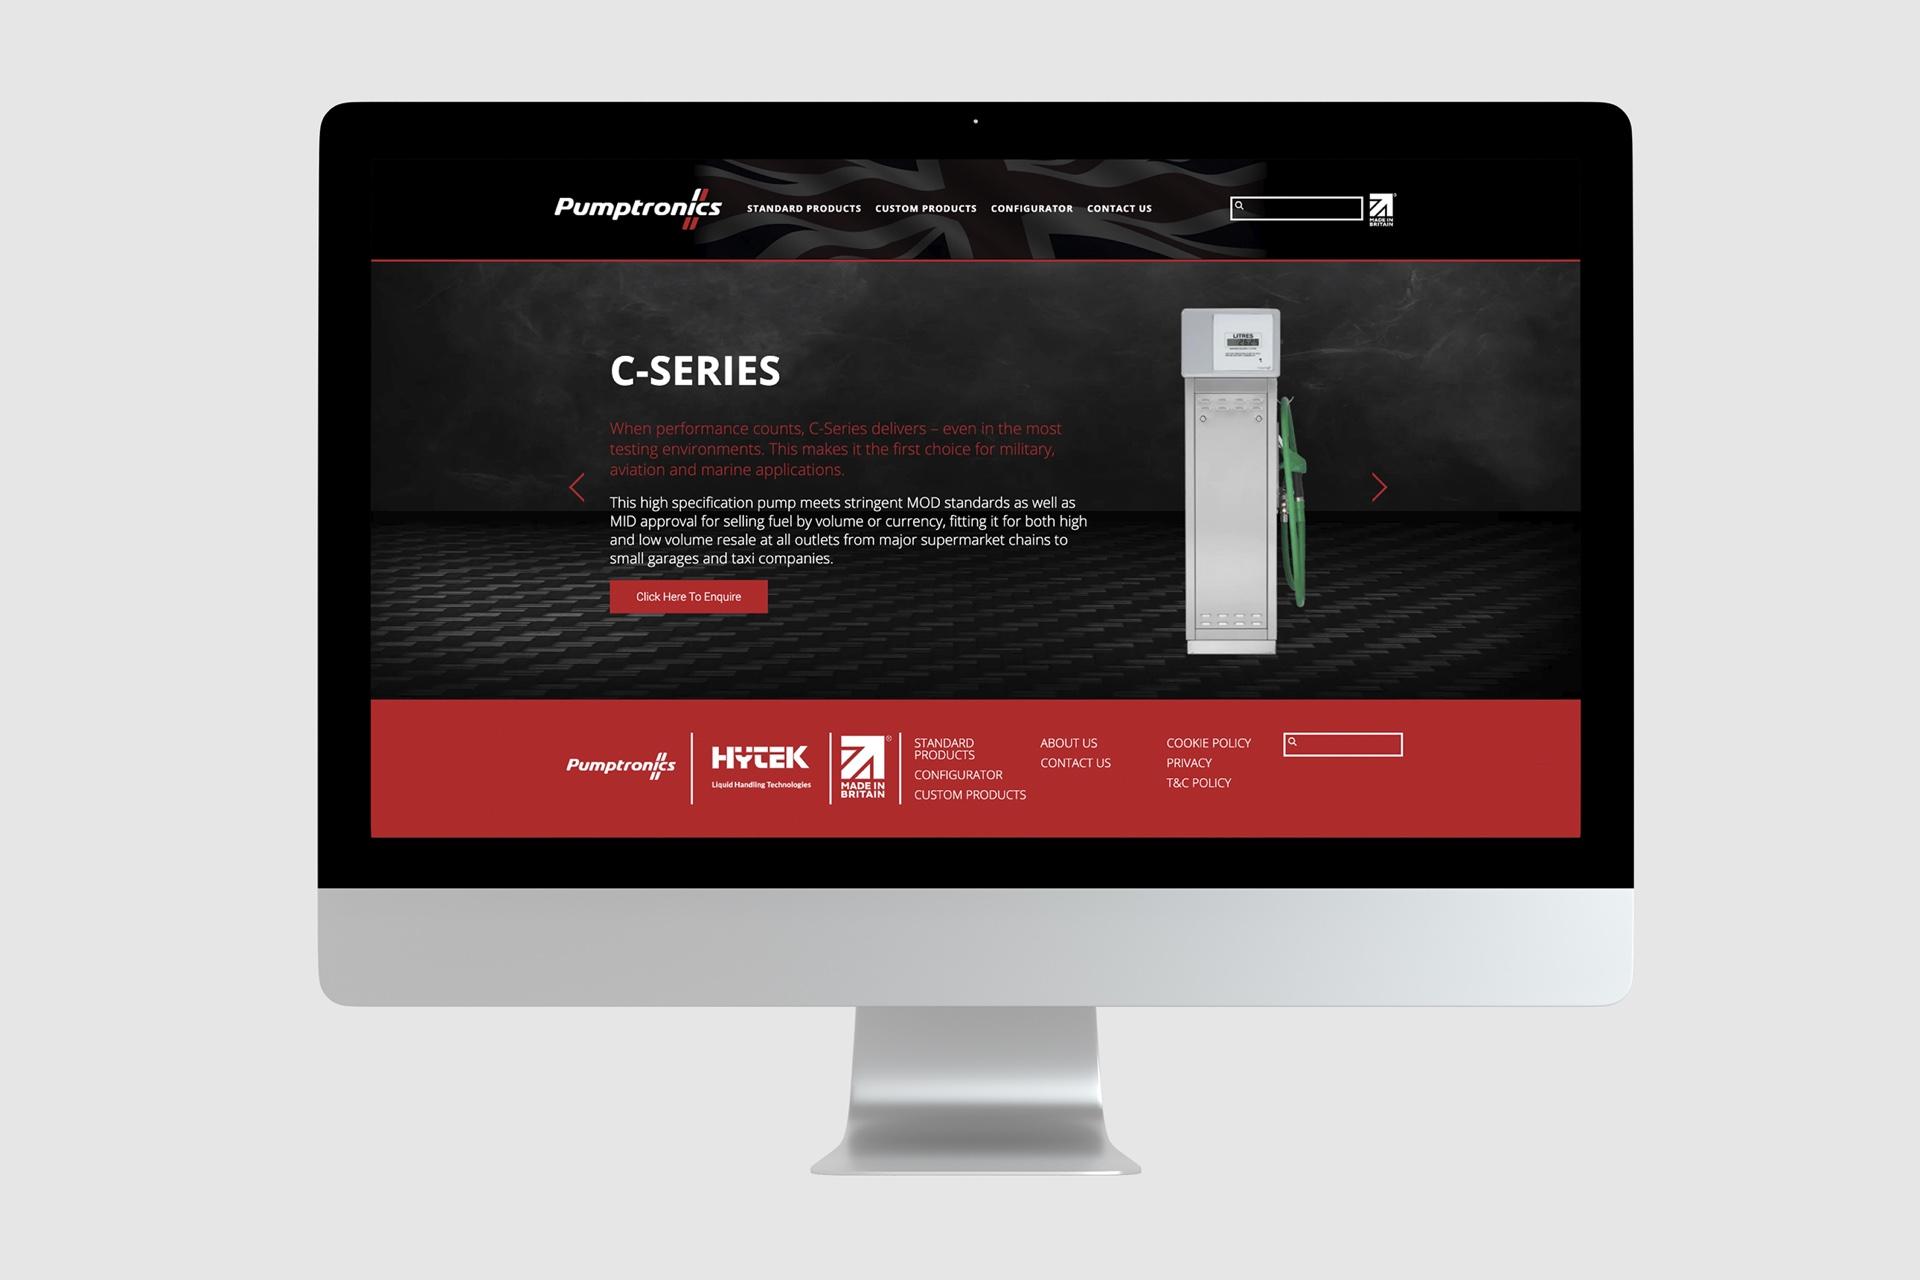 New Pumptronics website